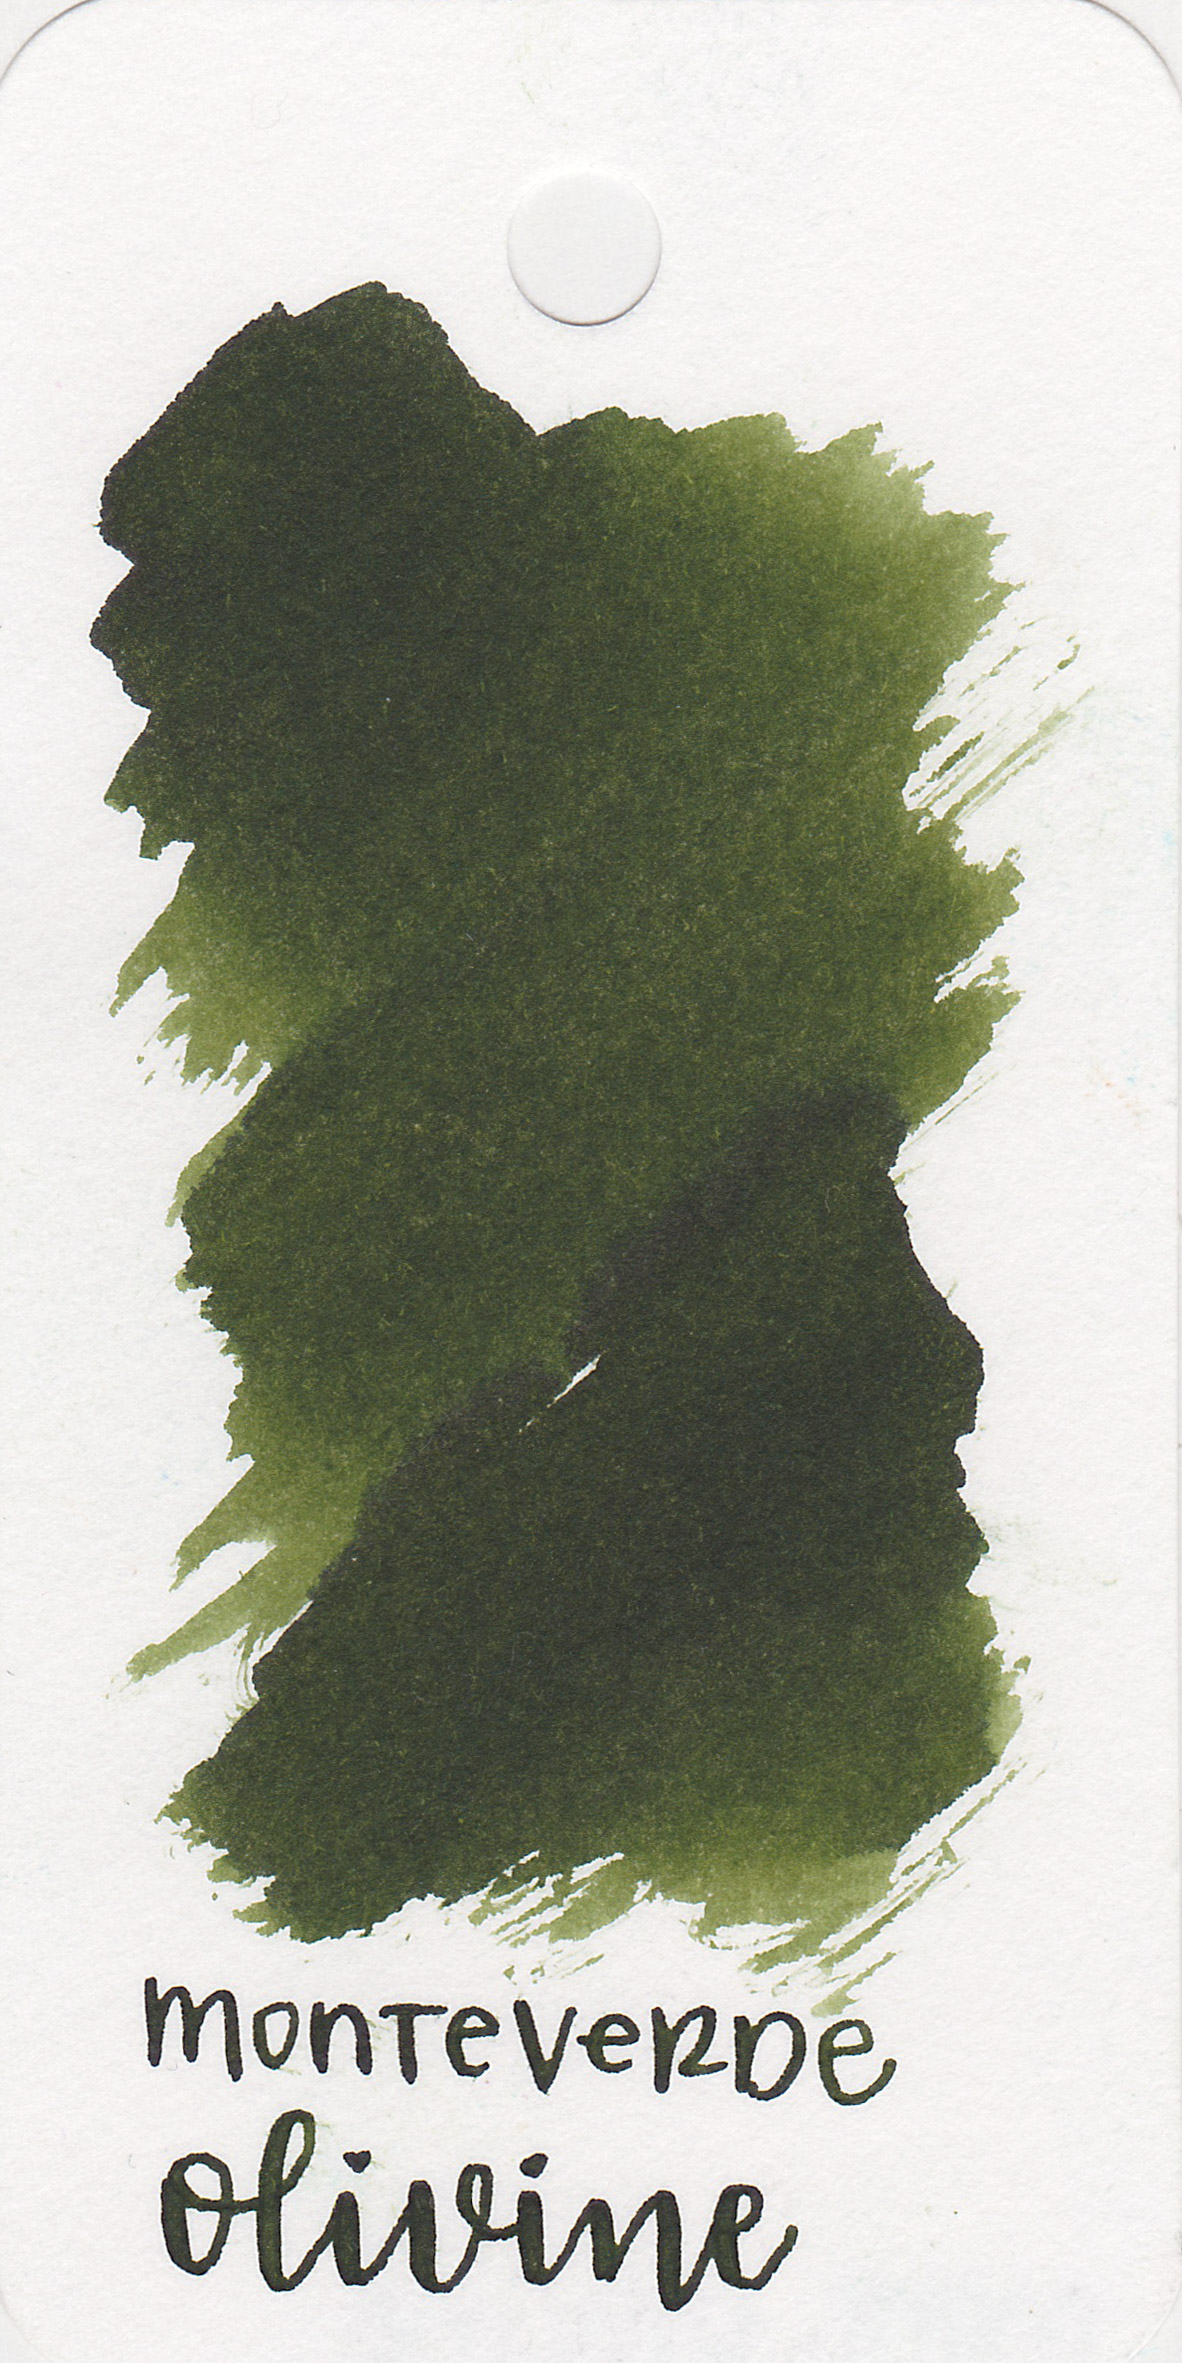 mv-olivine-1.jpg